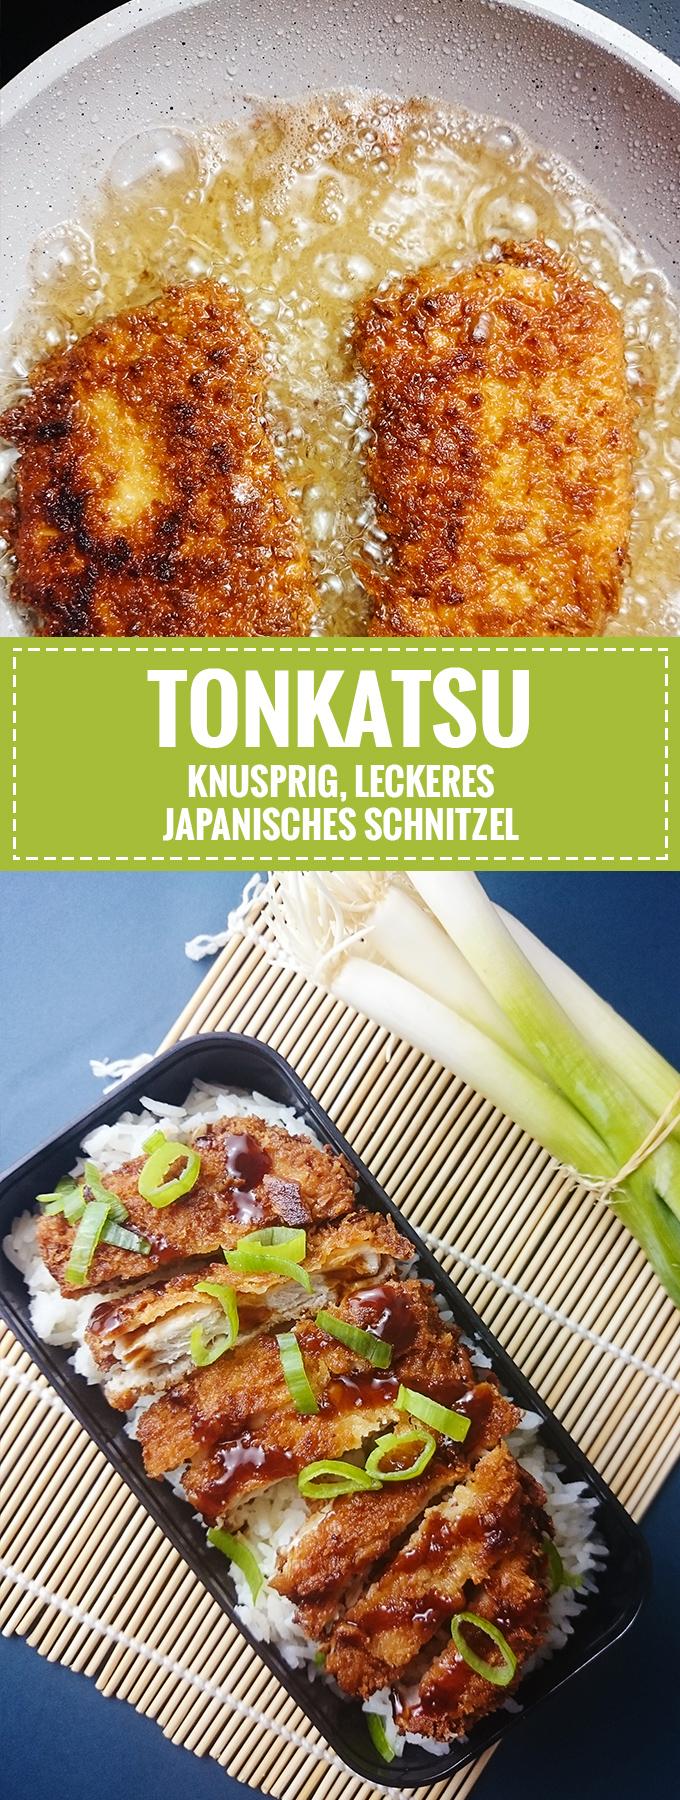 Tonkatsu – Knuspriges japanisches Schnitzel // Knabberkult.de